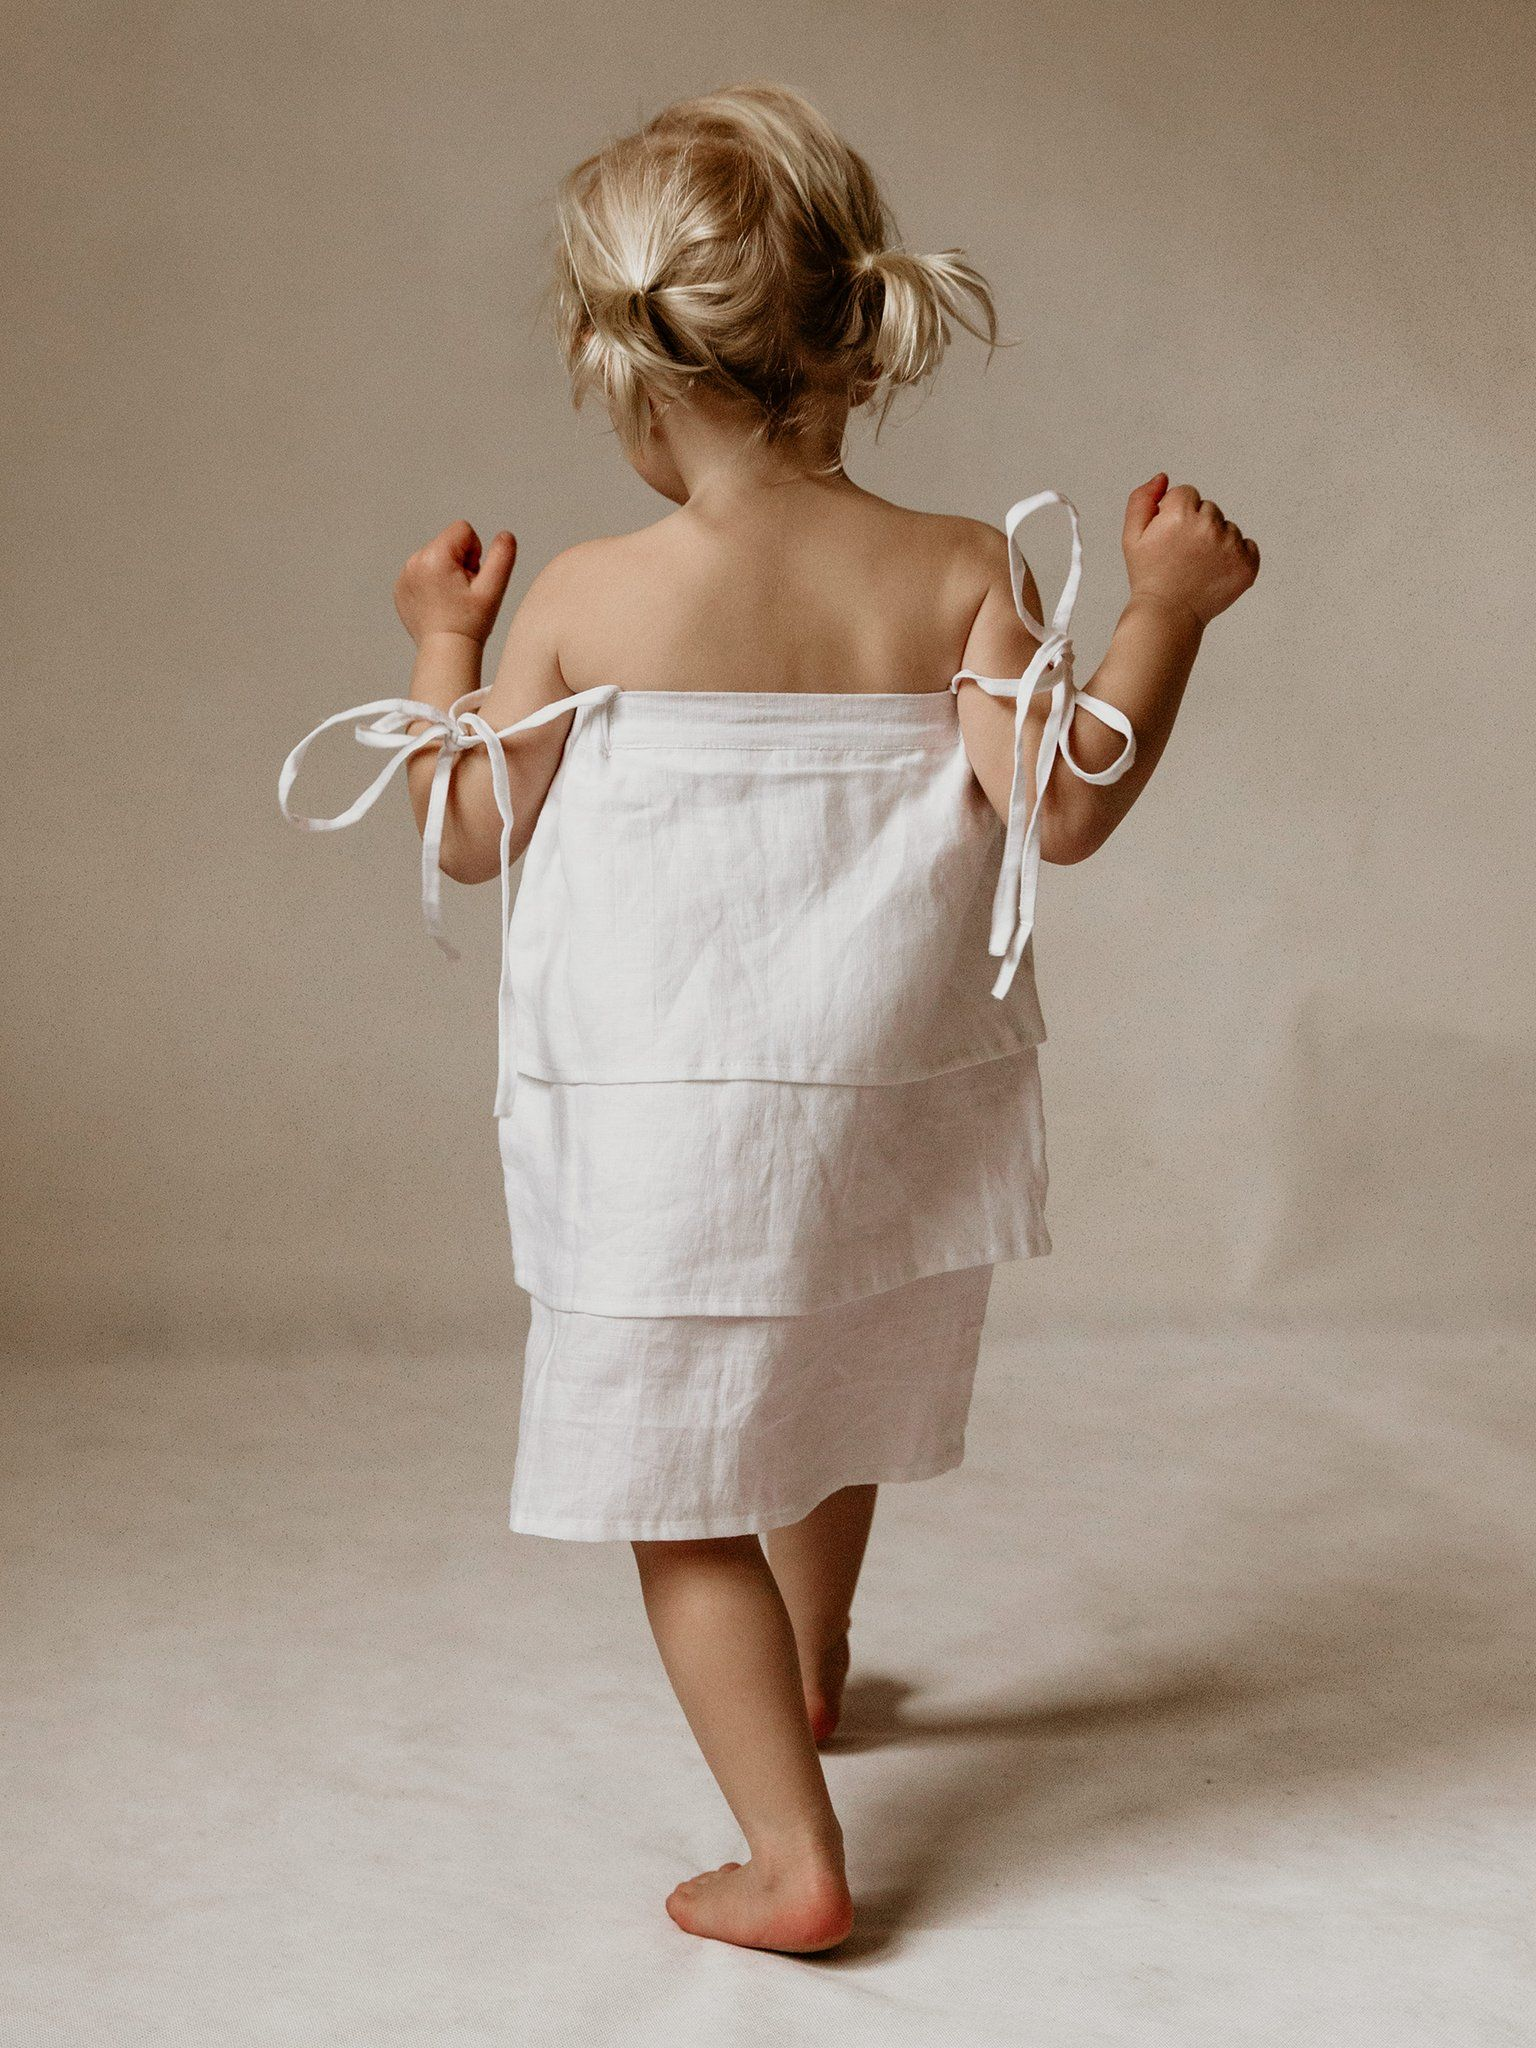 little girl undone Mini Marley | Sofie Dress in White | The UNDONE by Mini ...